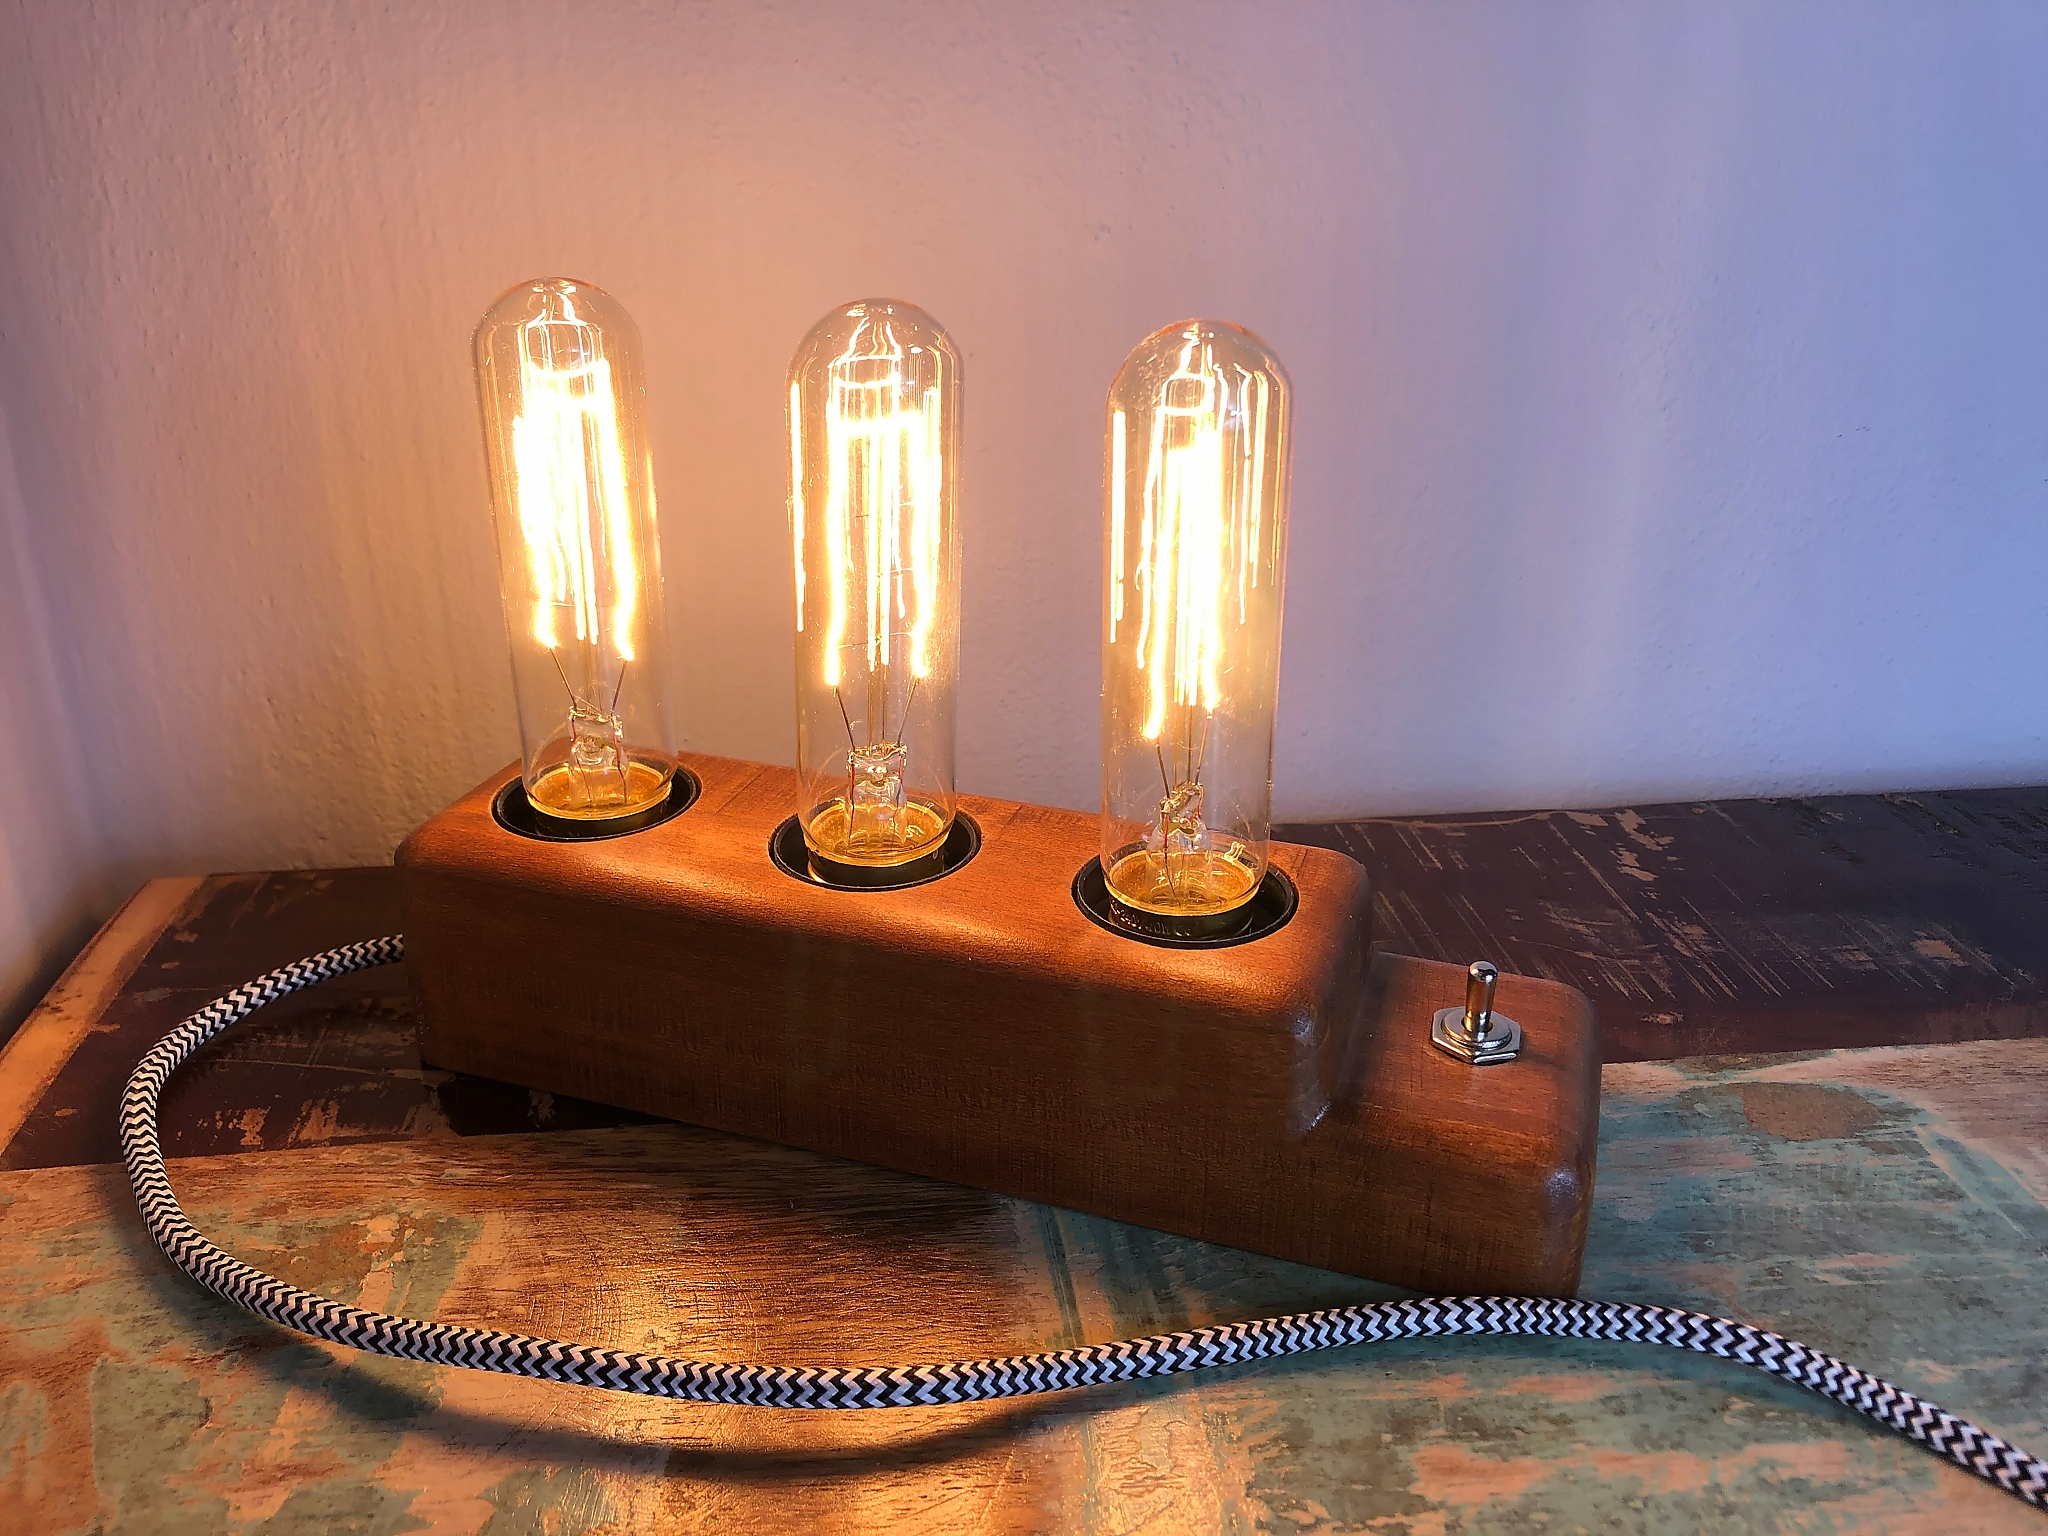 LAMPA EDISON RETRO PRIEMYSELNÝ LOFT DIZAJN TEAK